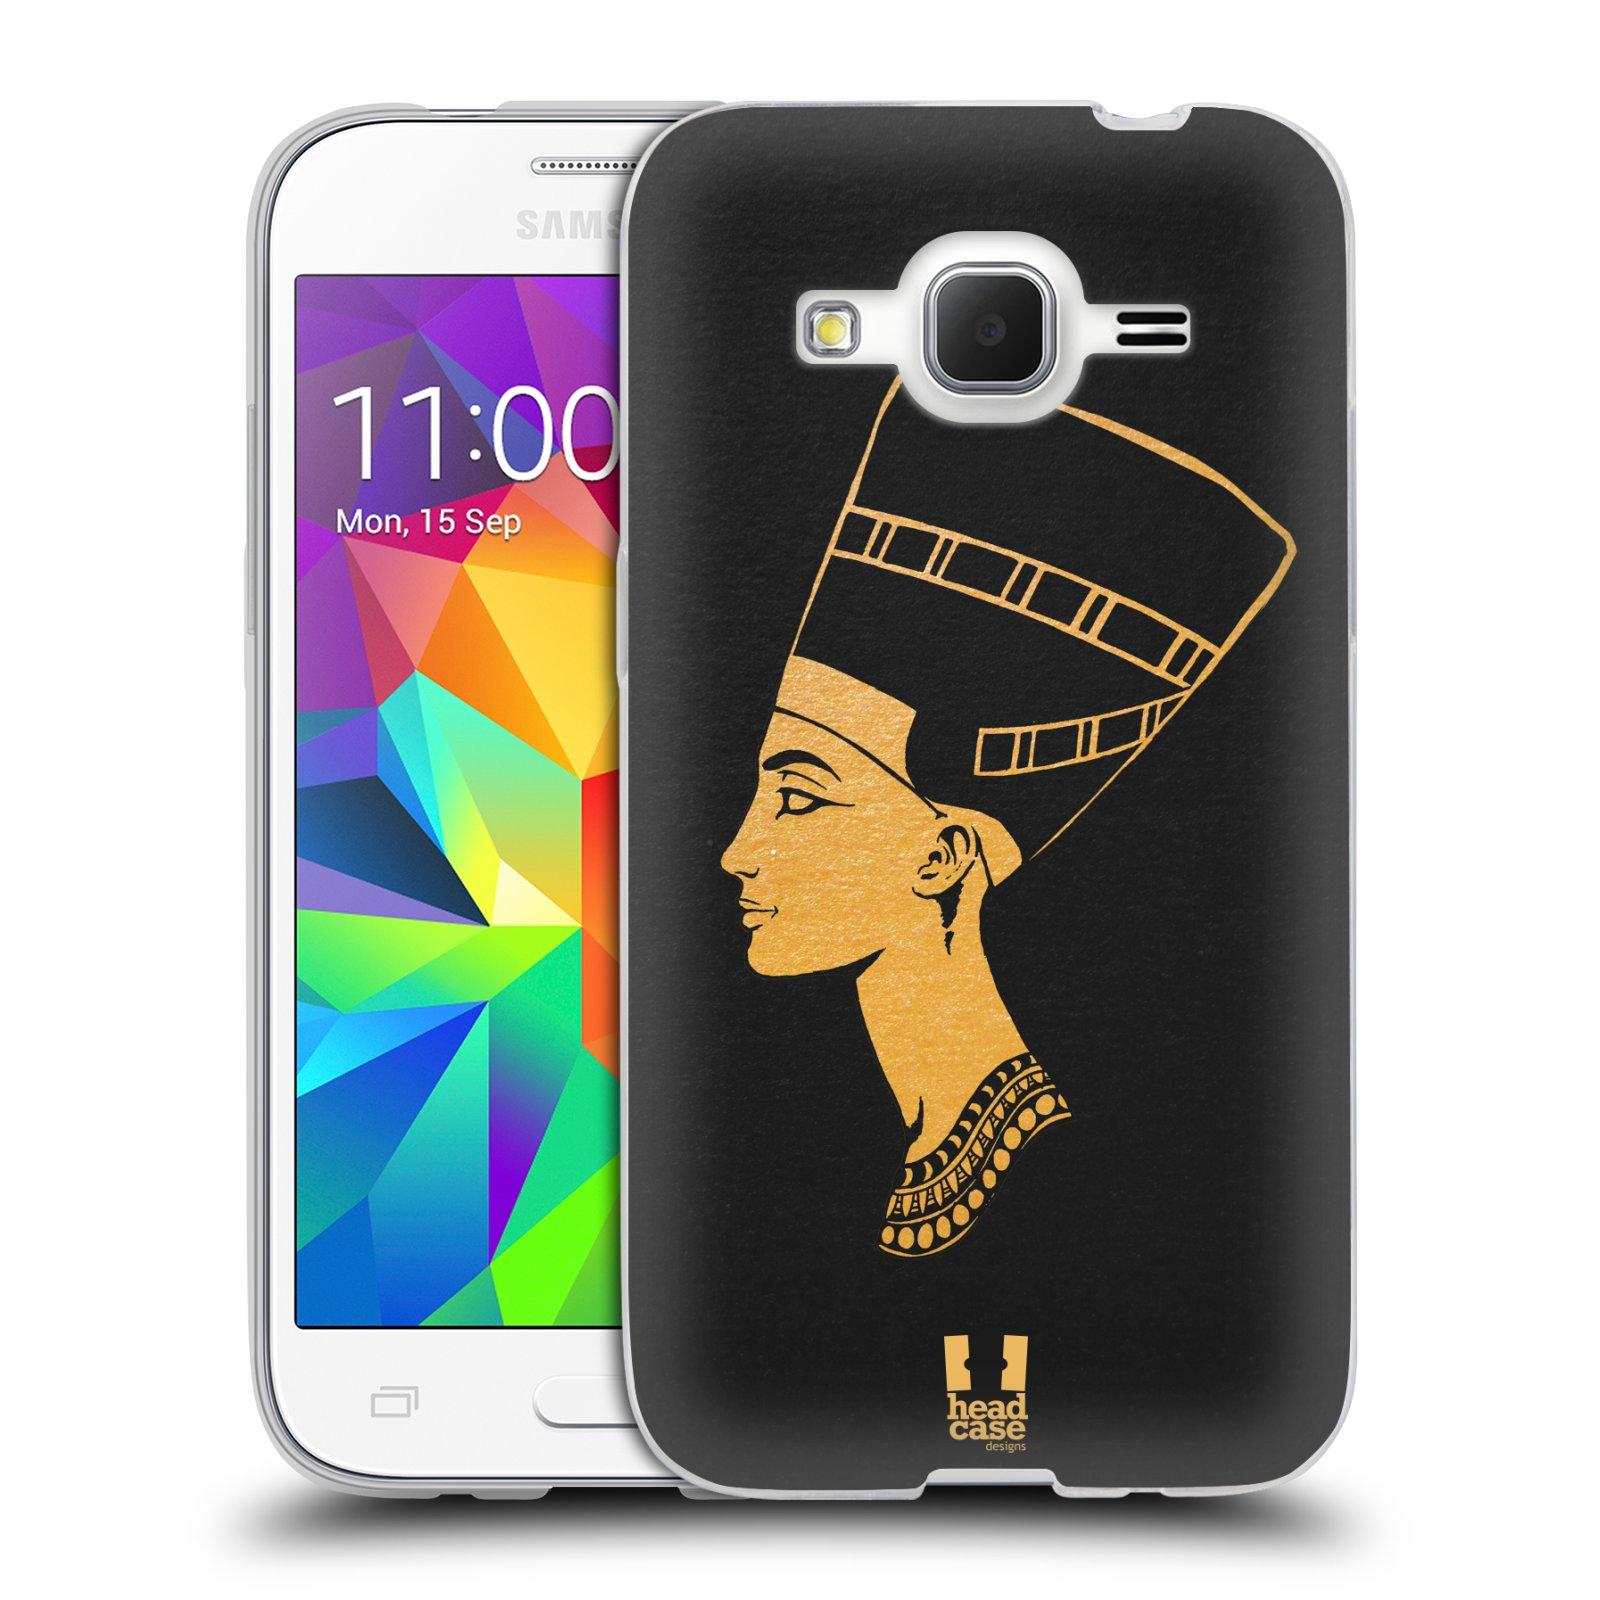 Silikonové pouzdro na mobil Samsung Galaxy Core Prime LTE HEAD CASE EGYPT NEFERTITI (Silikonový kryt či obal na mobilní telefon Samsung Galaxy Core Prime LTE SM-G360)